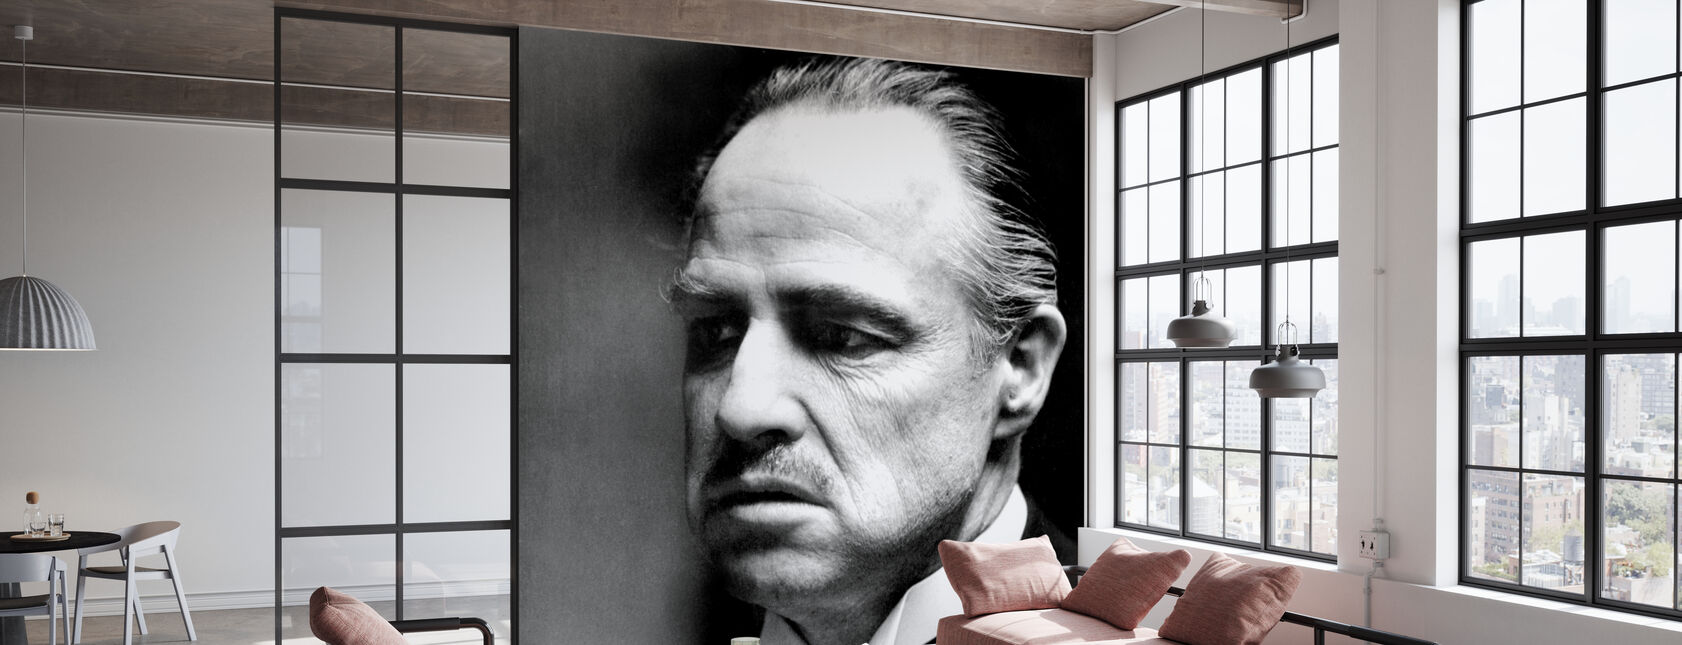 De peetvader - Don Vito Corleone - Behang - Kantoor